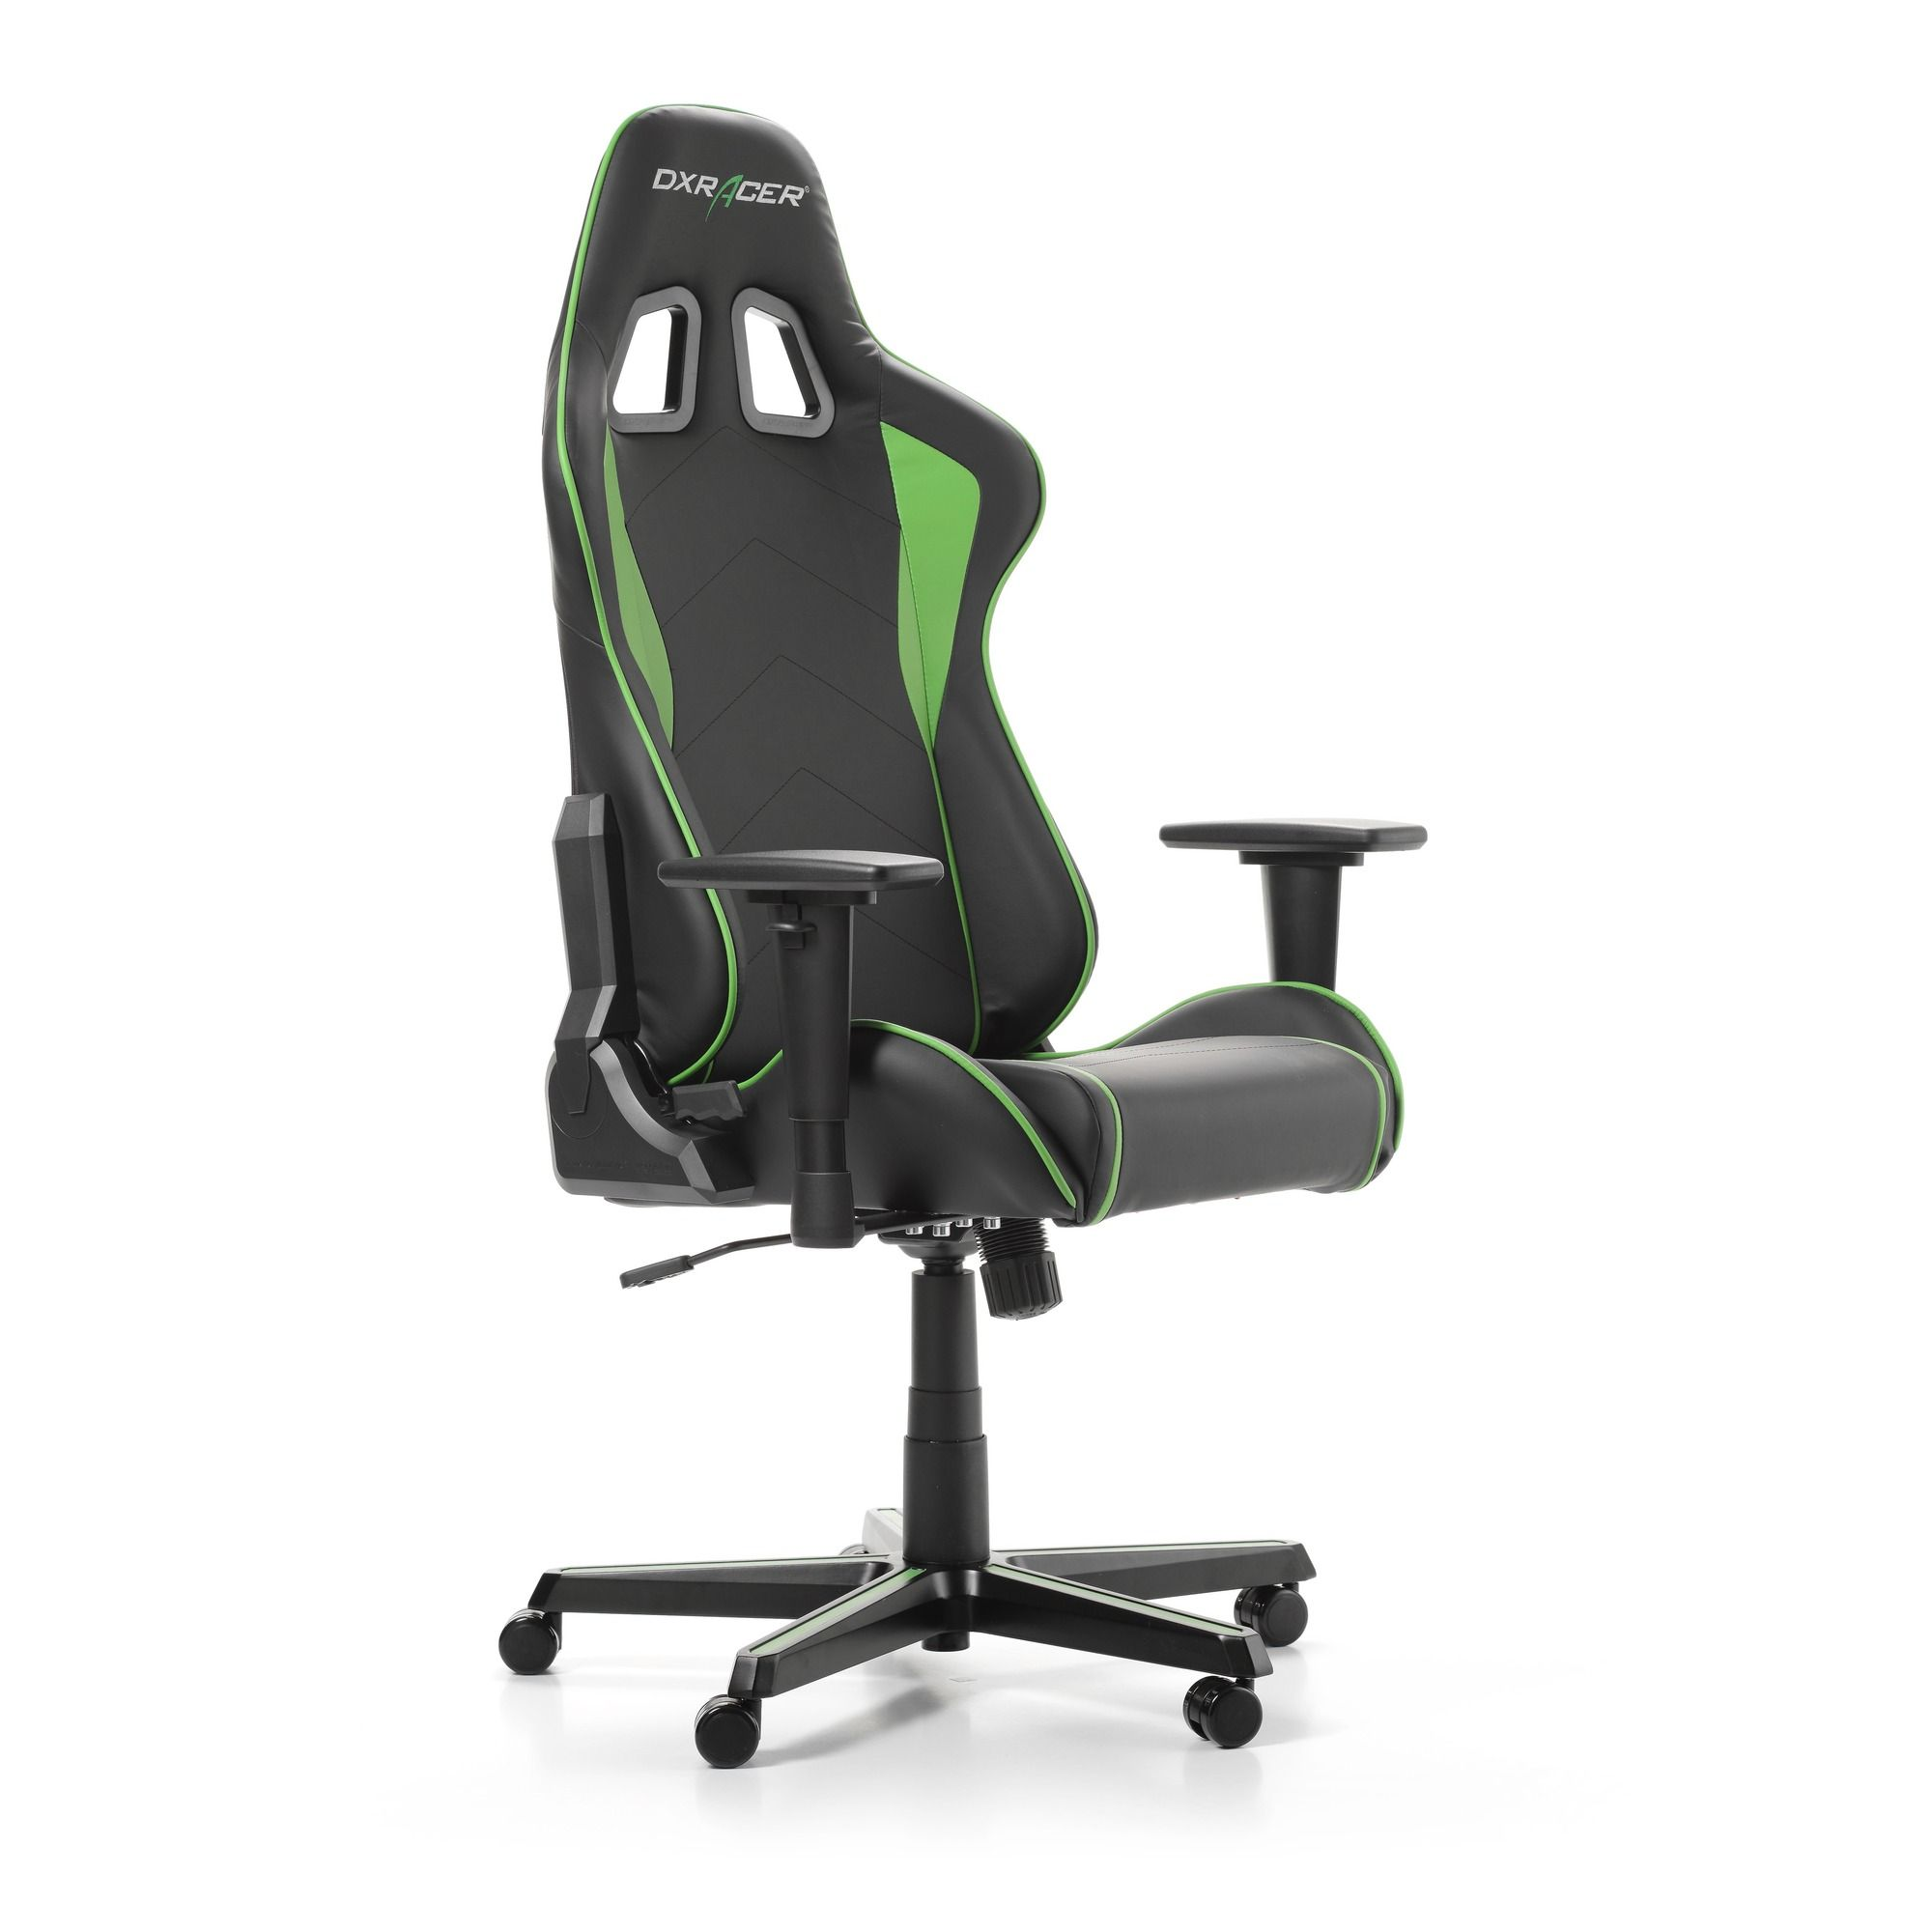 Геймърски стол DXRacer - серия FORMULA, черен/зелен - OH/FH08/NE - 9